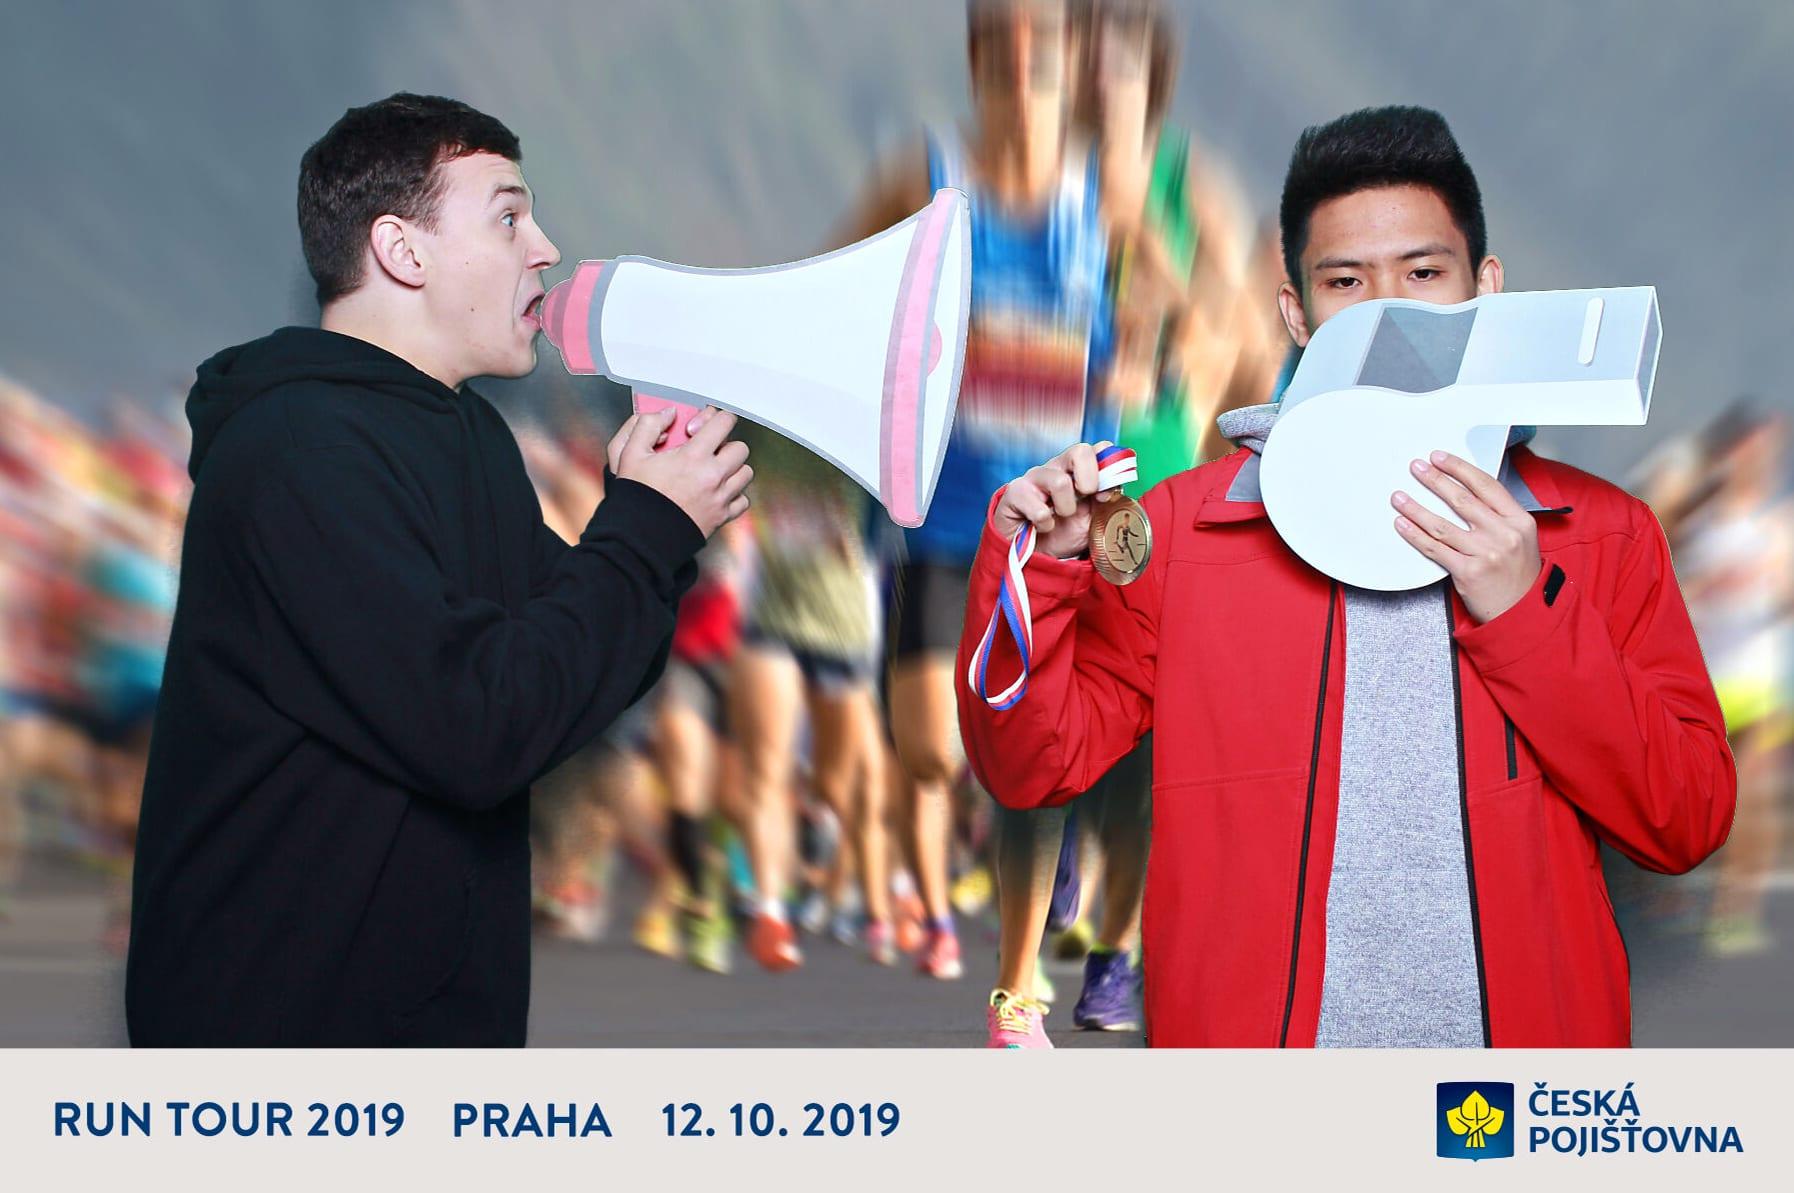 fotokoutek-praha-promo-akce-ceska-pojistovna-run-tour-praha-12-10-2019-661749